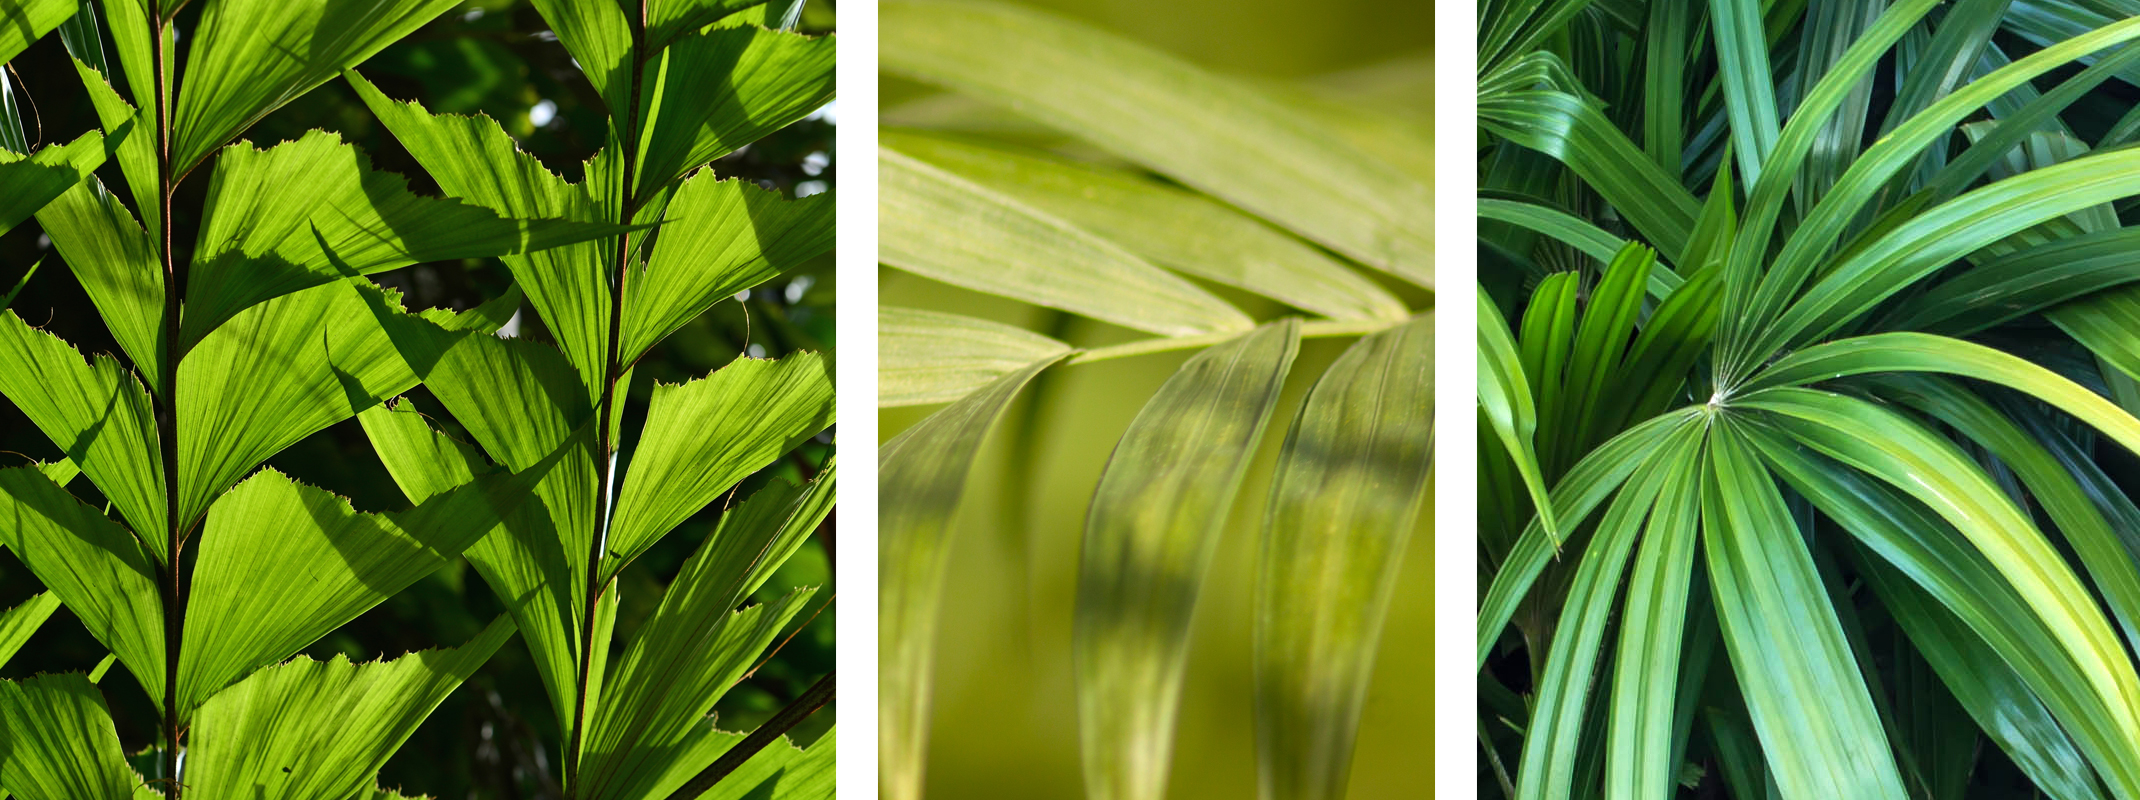 Fishtail Palm, Rhapis Palm and Kentia Palm